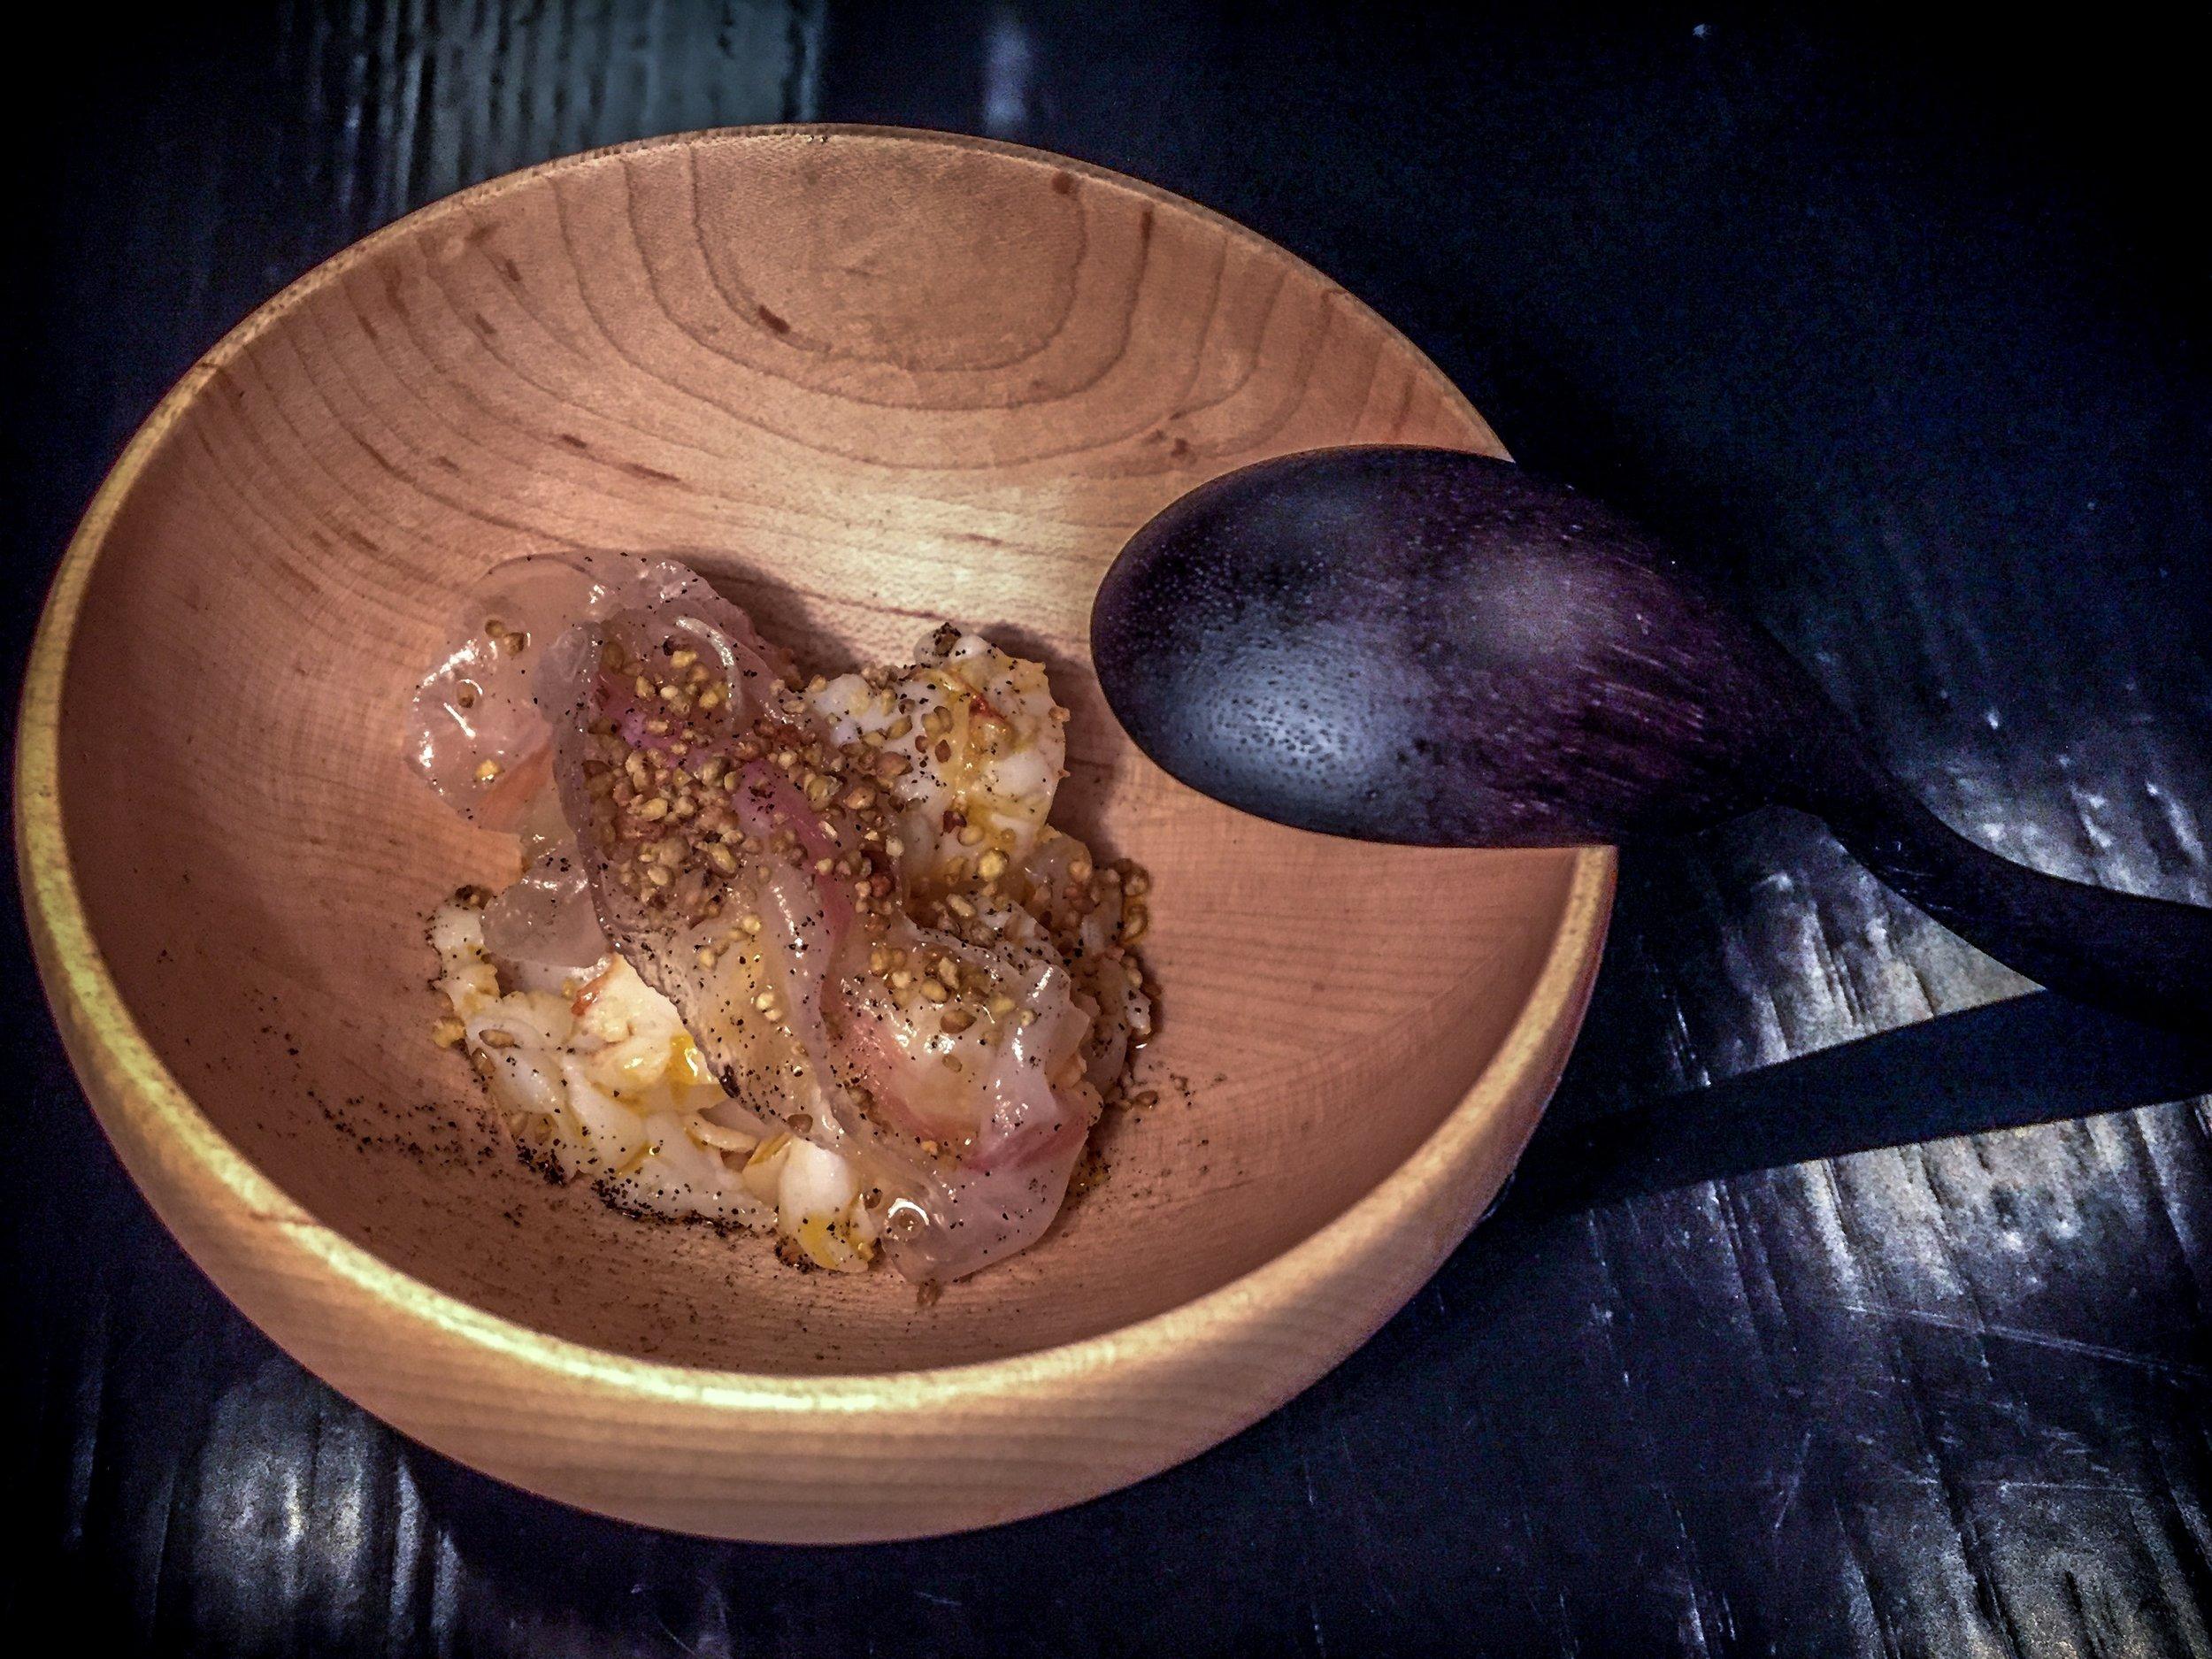 Scampi, jamon cream, pickled Barletta onions, cured pork cheek, sobacha.